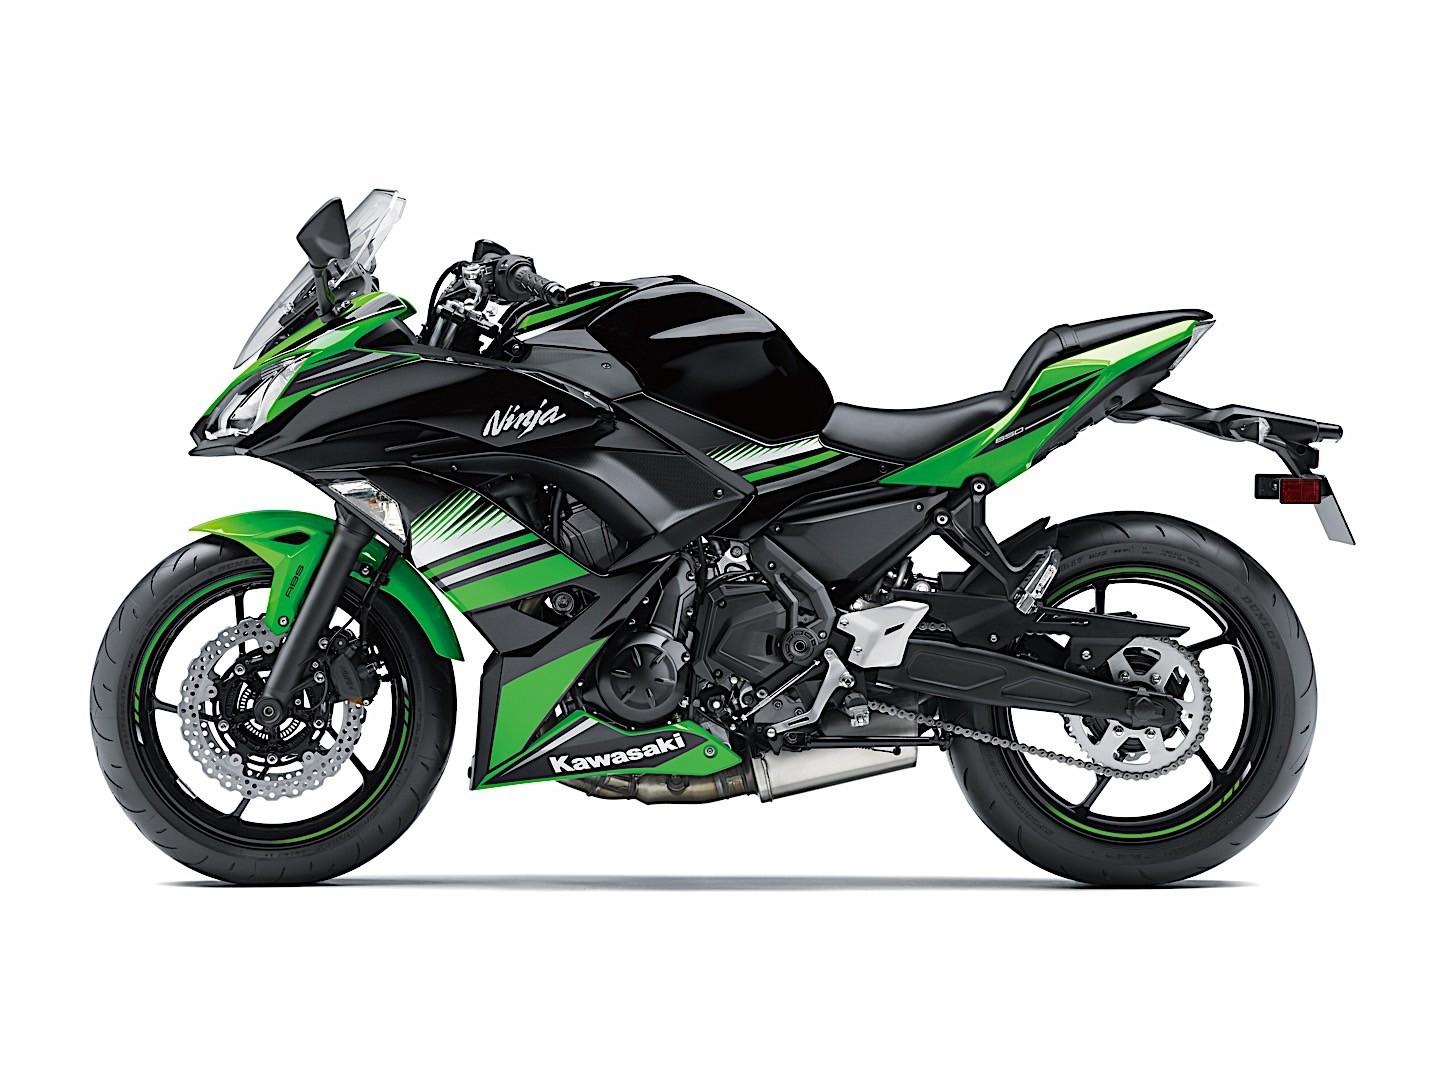 2017 Kawasaki Ninja 650 Revealed at INTERMOT - autoevolution